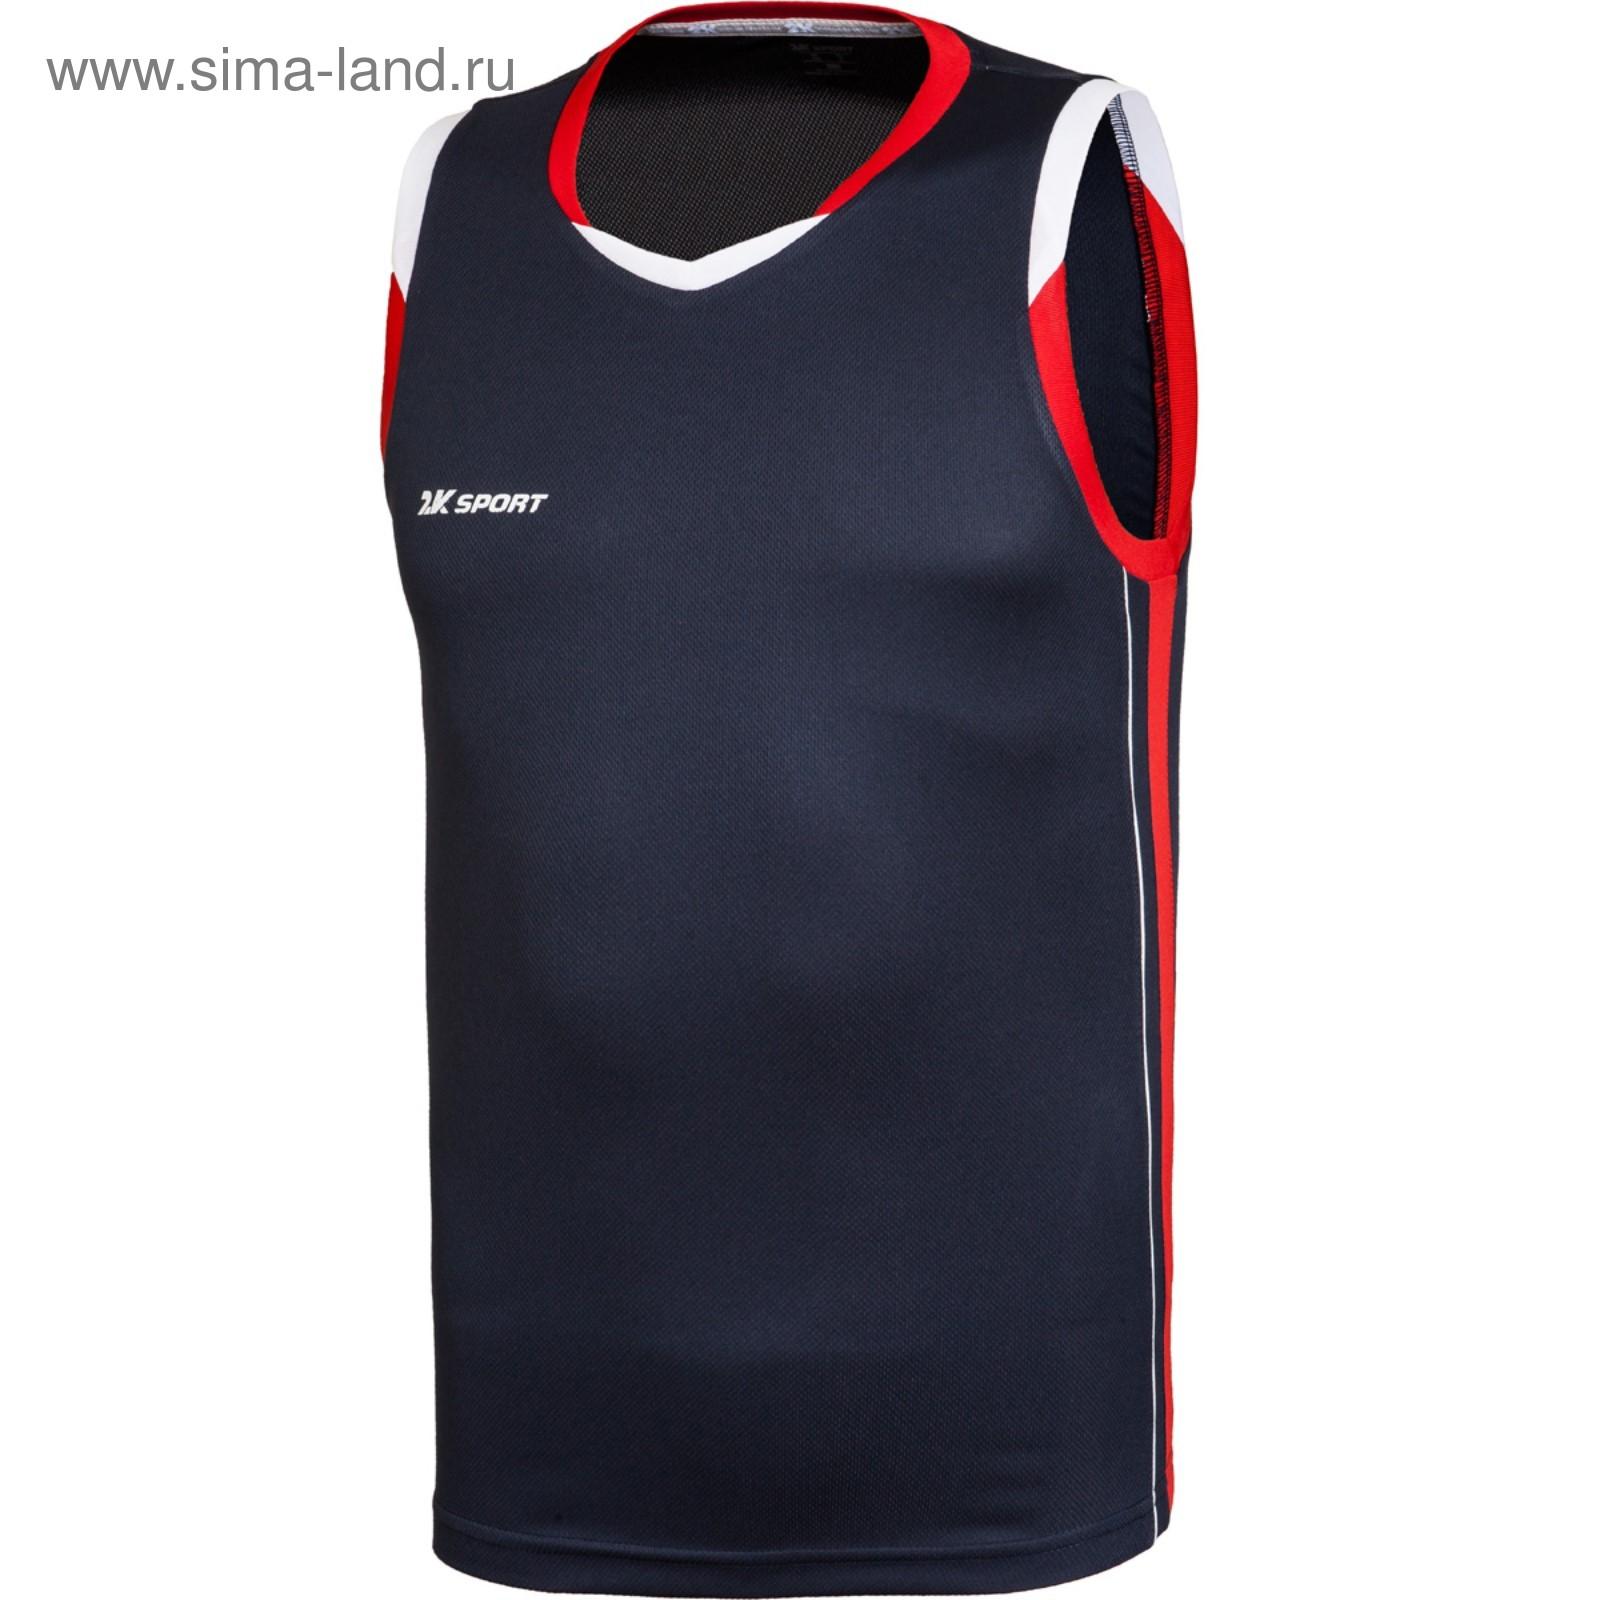 9fd976d2 Баскетбольная игровая майка 2K Sport Advance navy/red/white, XS ...